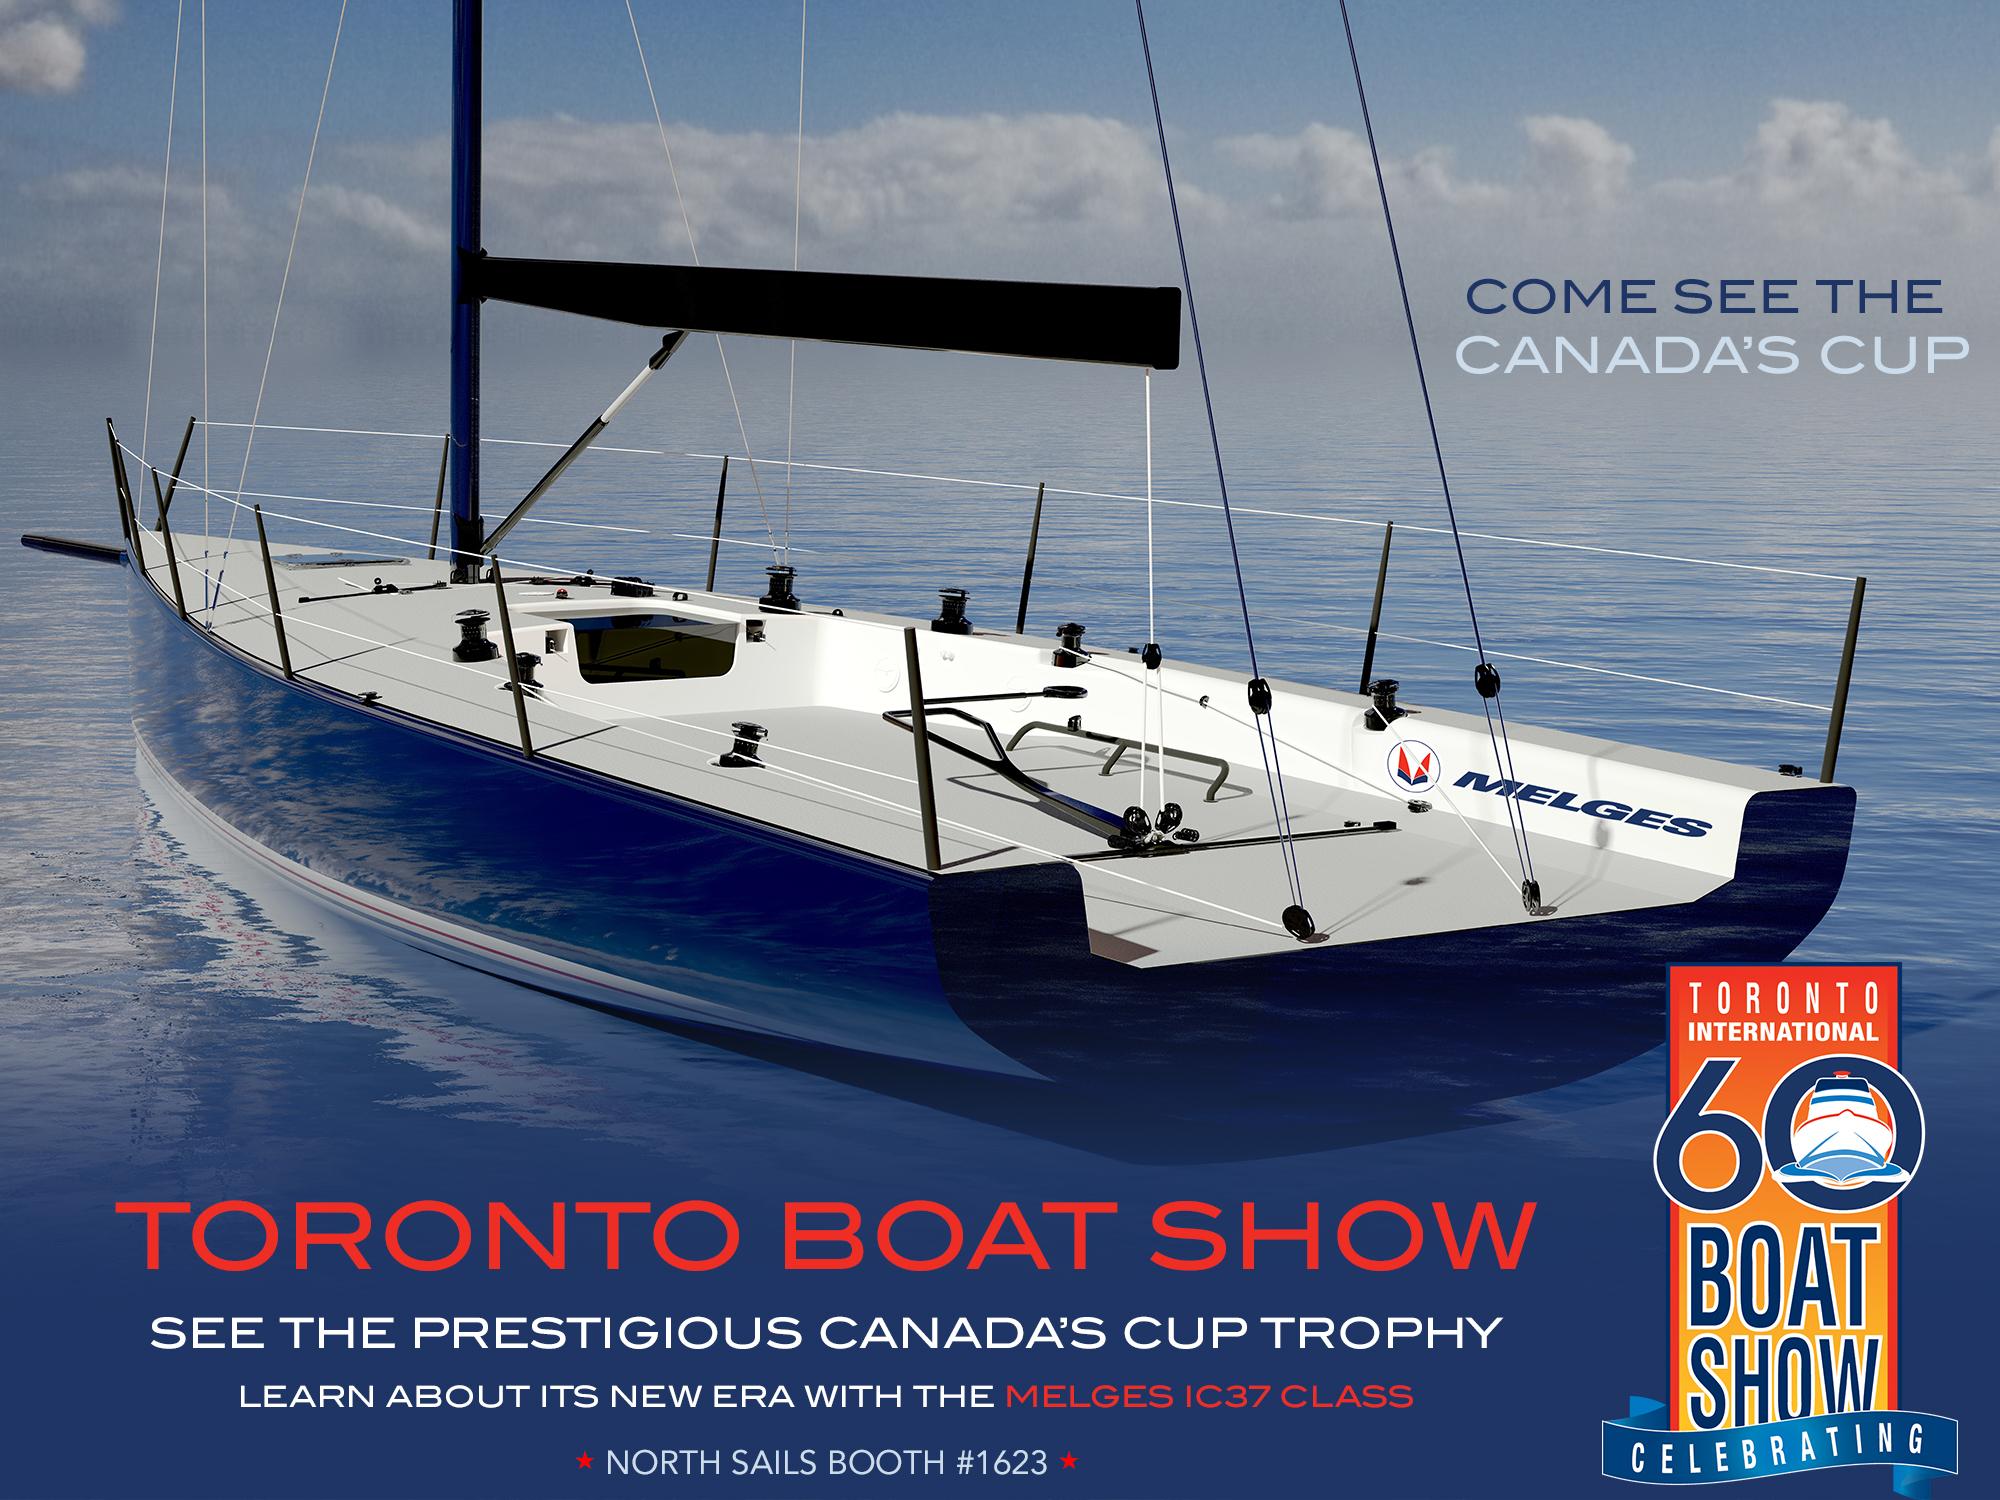 Toronto Boat Show Promo.jpg